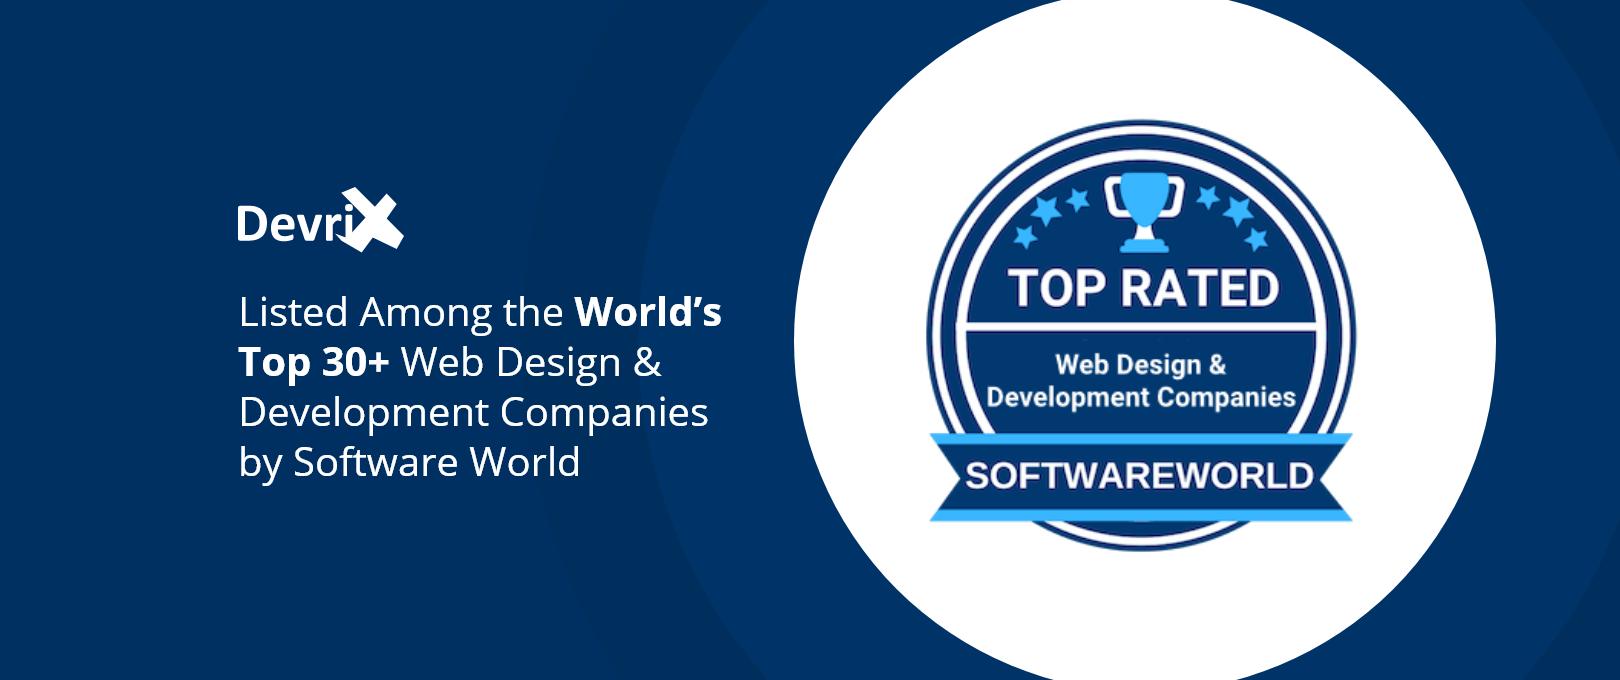 DevriX on World's-Top 30-Web-Design-&-Development-Companies